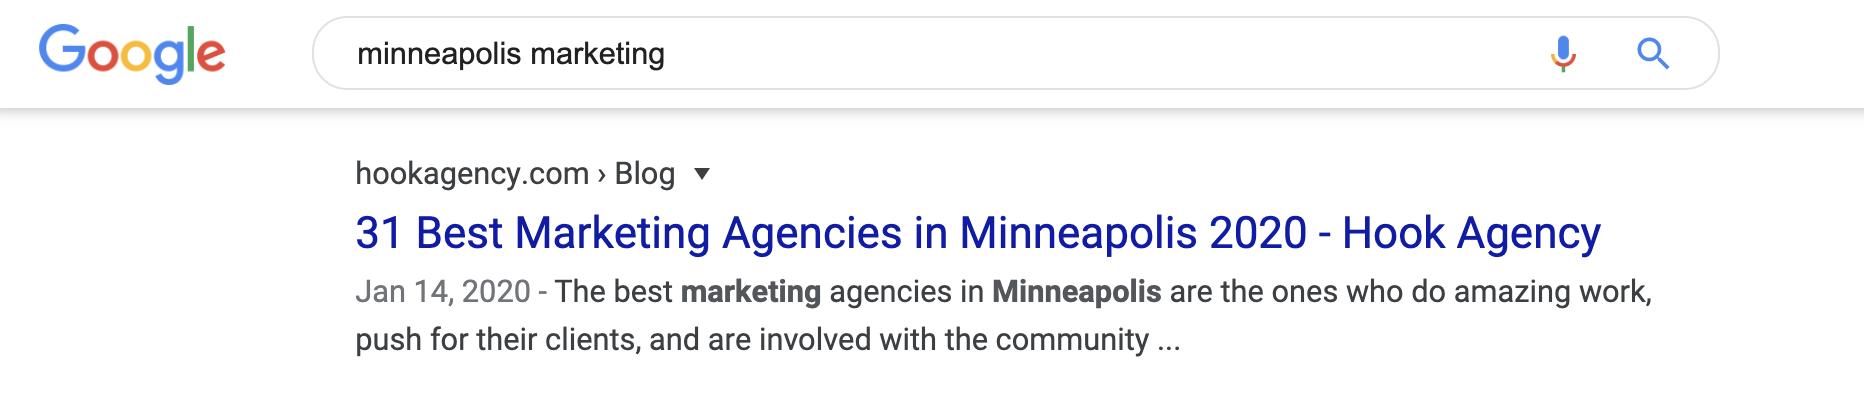 Minneapolis Marketing Agencies